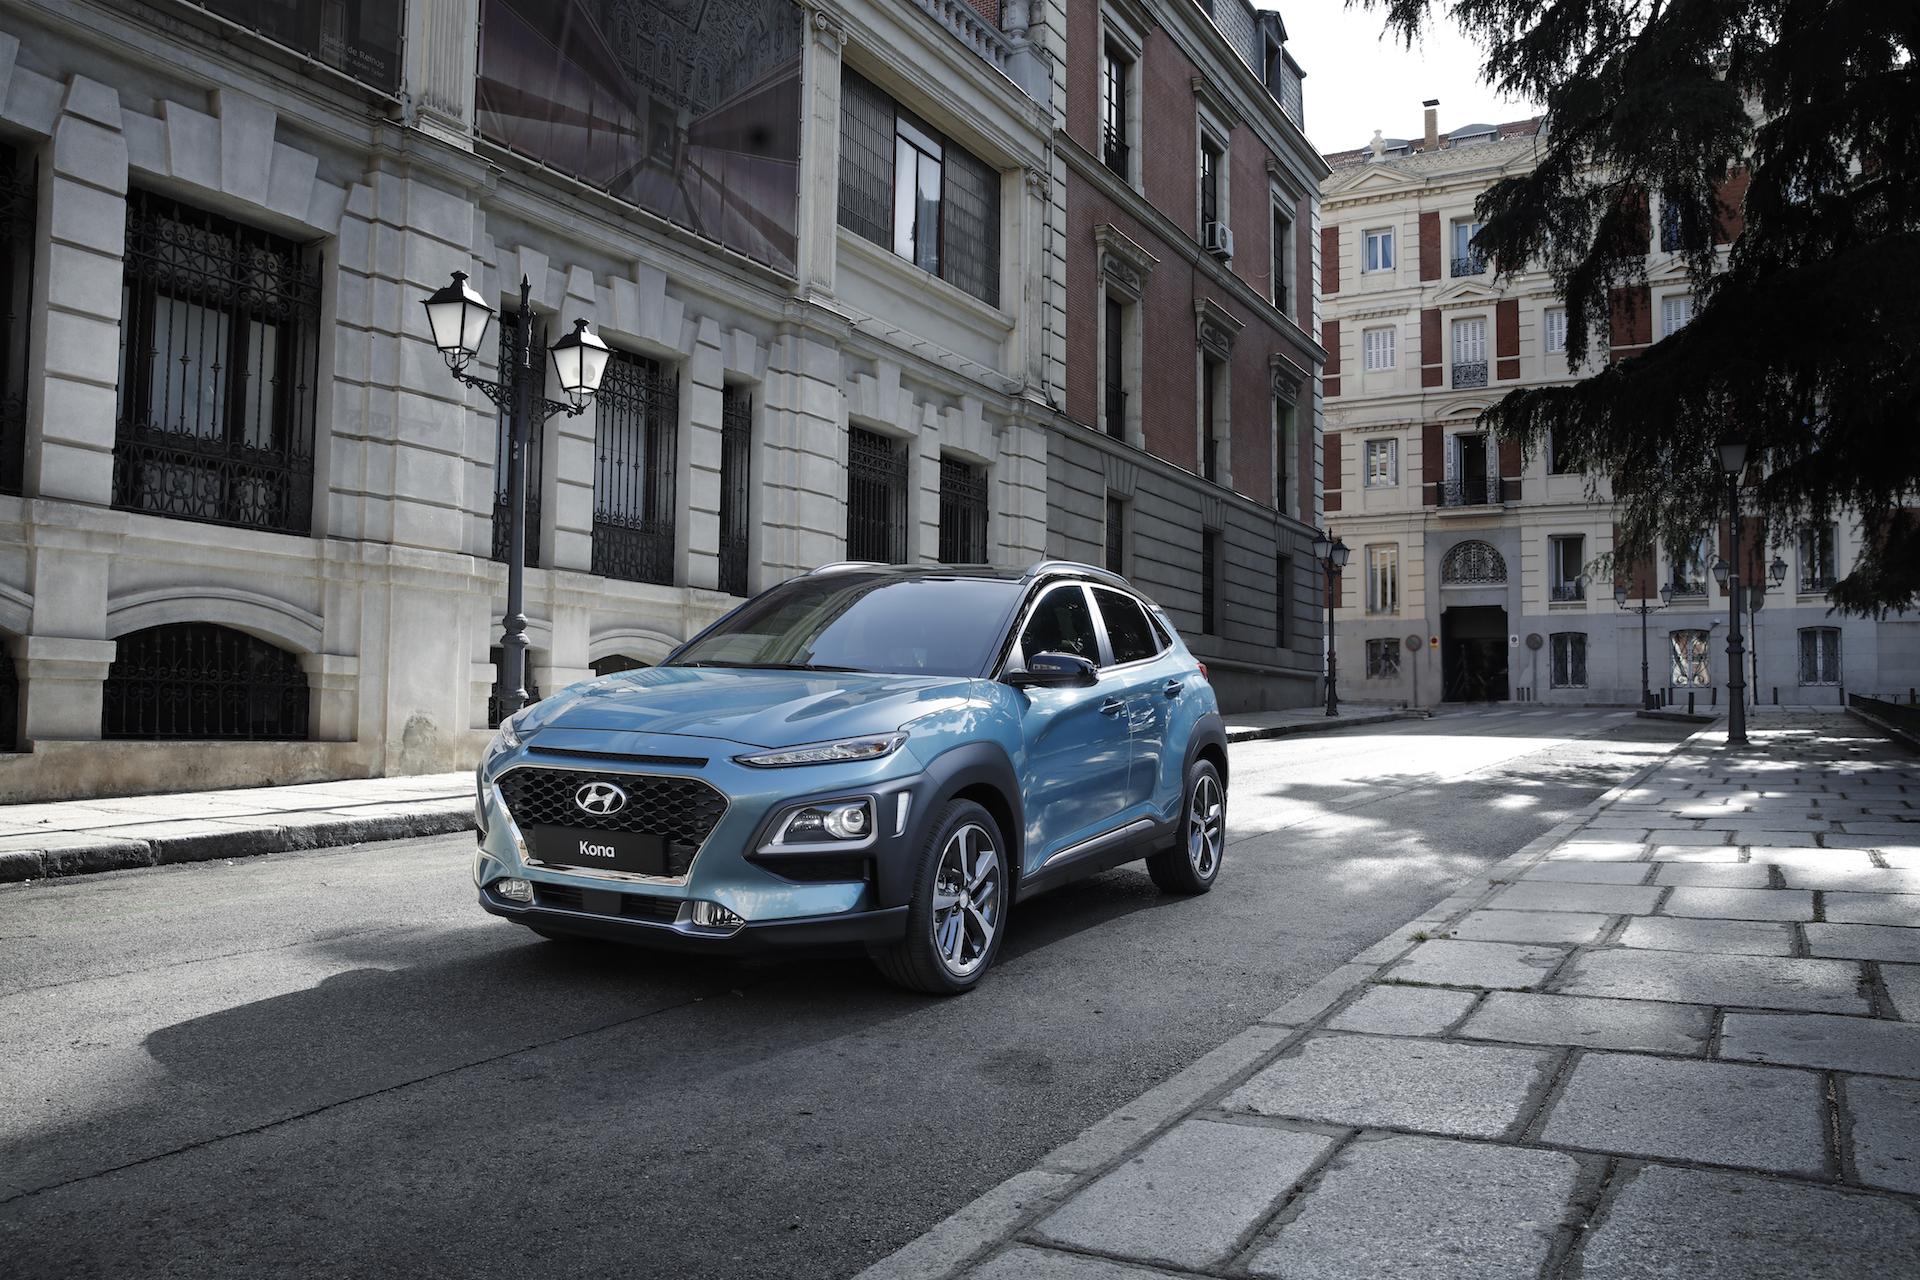 Electric Hyundai Kona Kia Niro Production To Rise Again